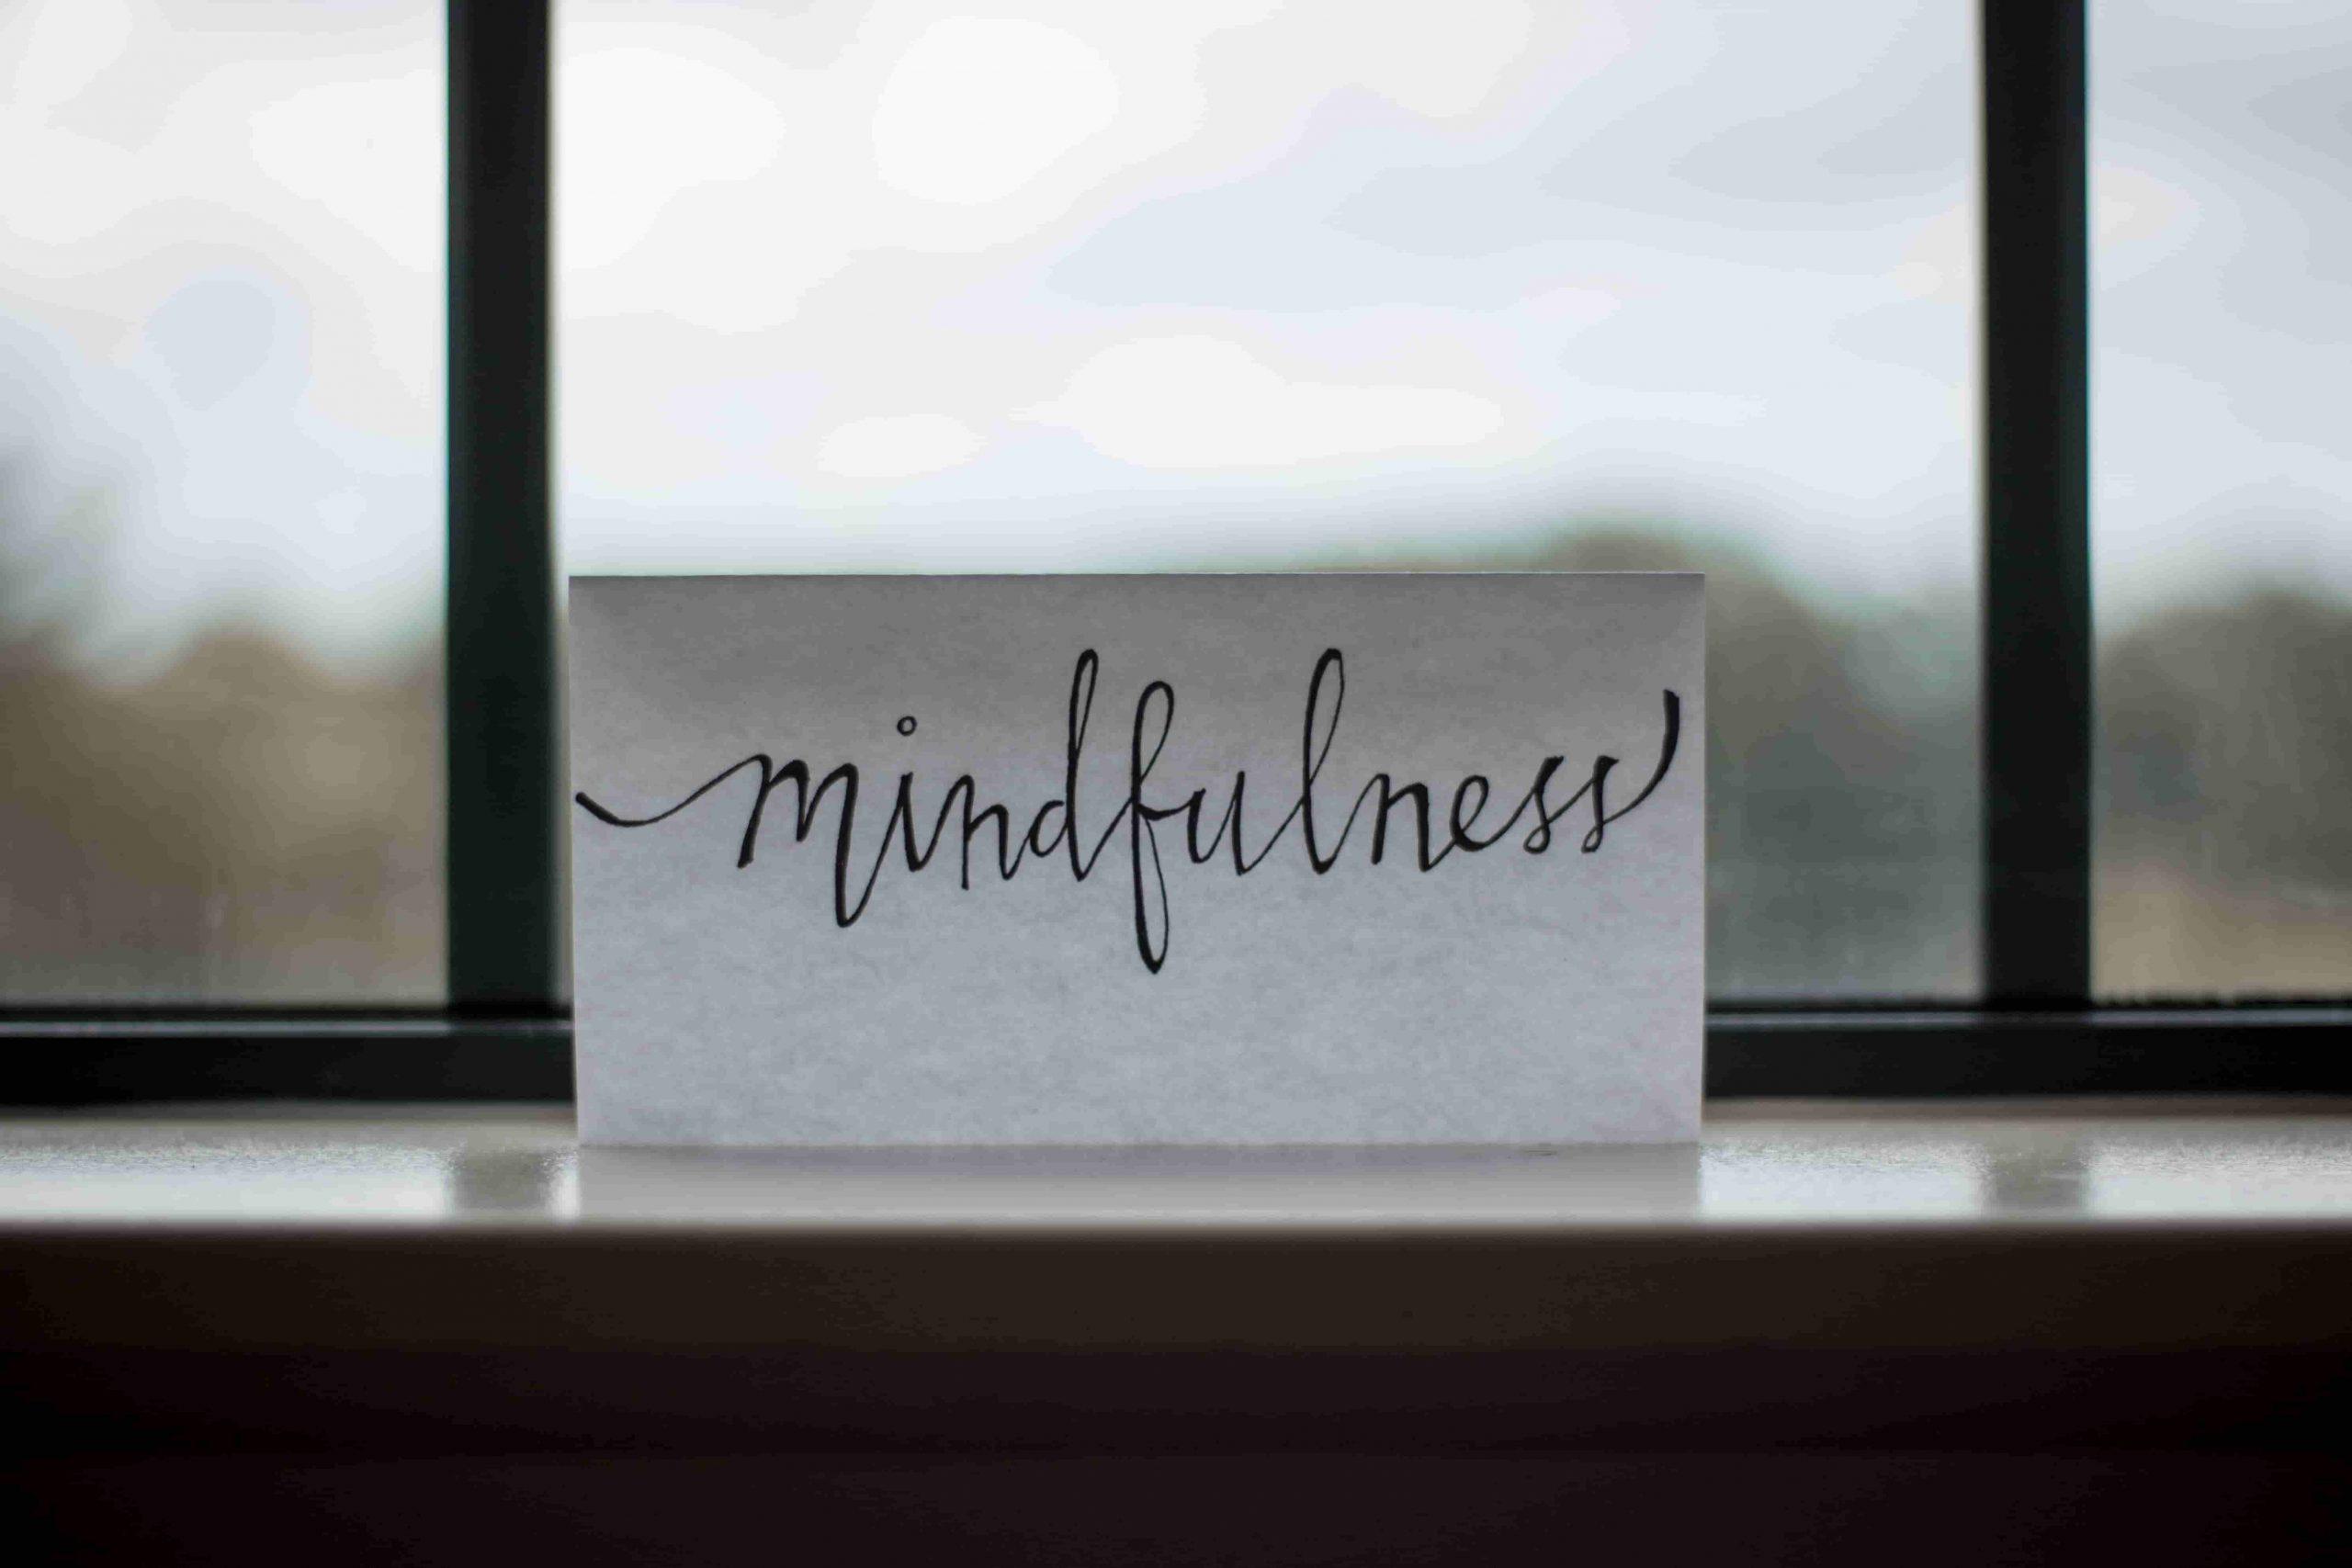 papel con la palabra mindfulness escrita